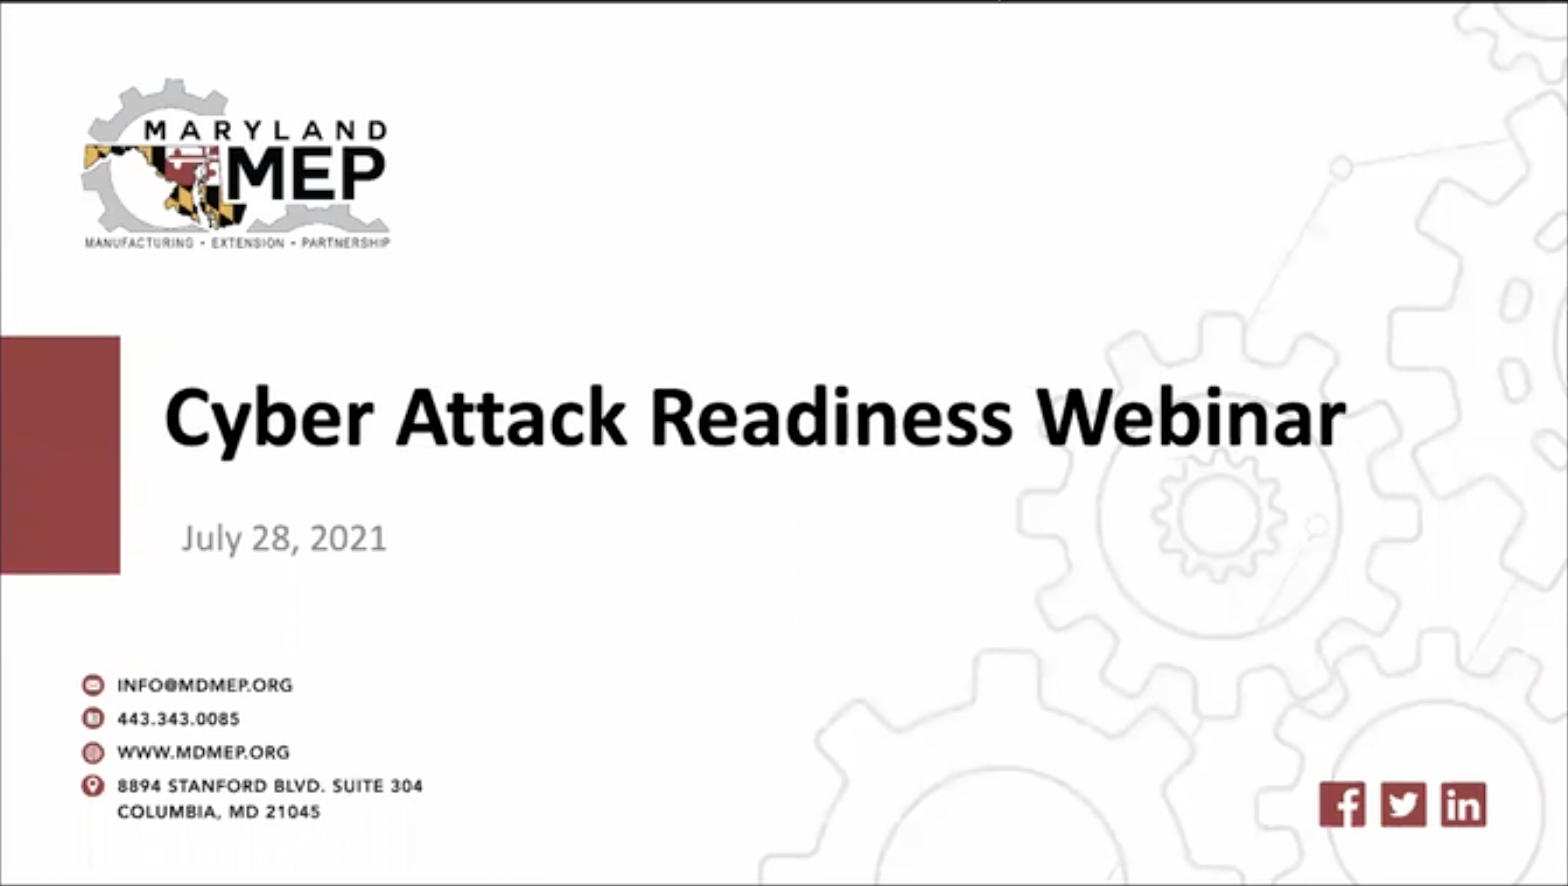 CyberAttackReadiness